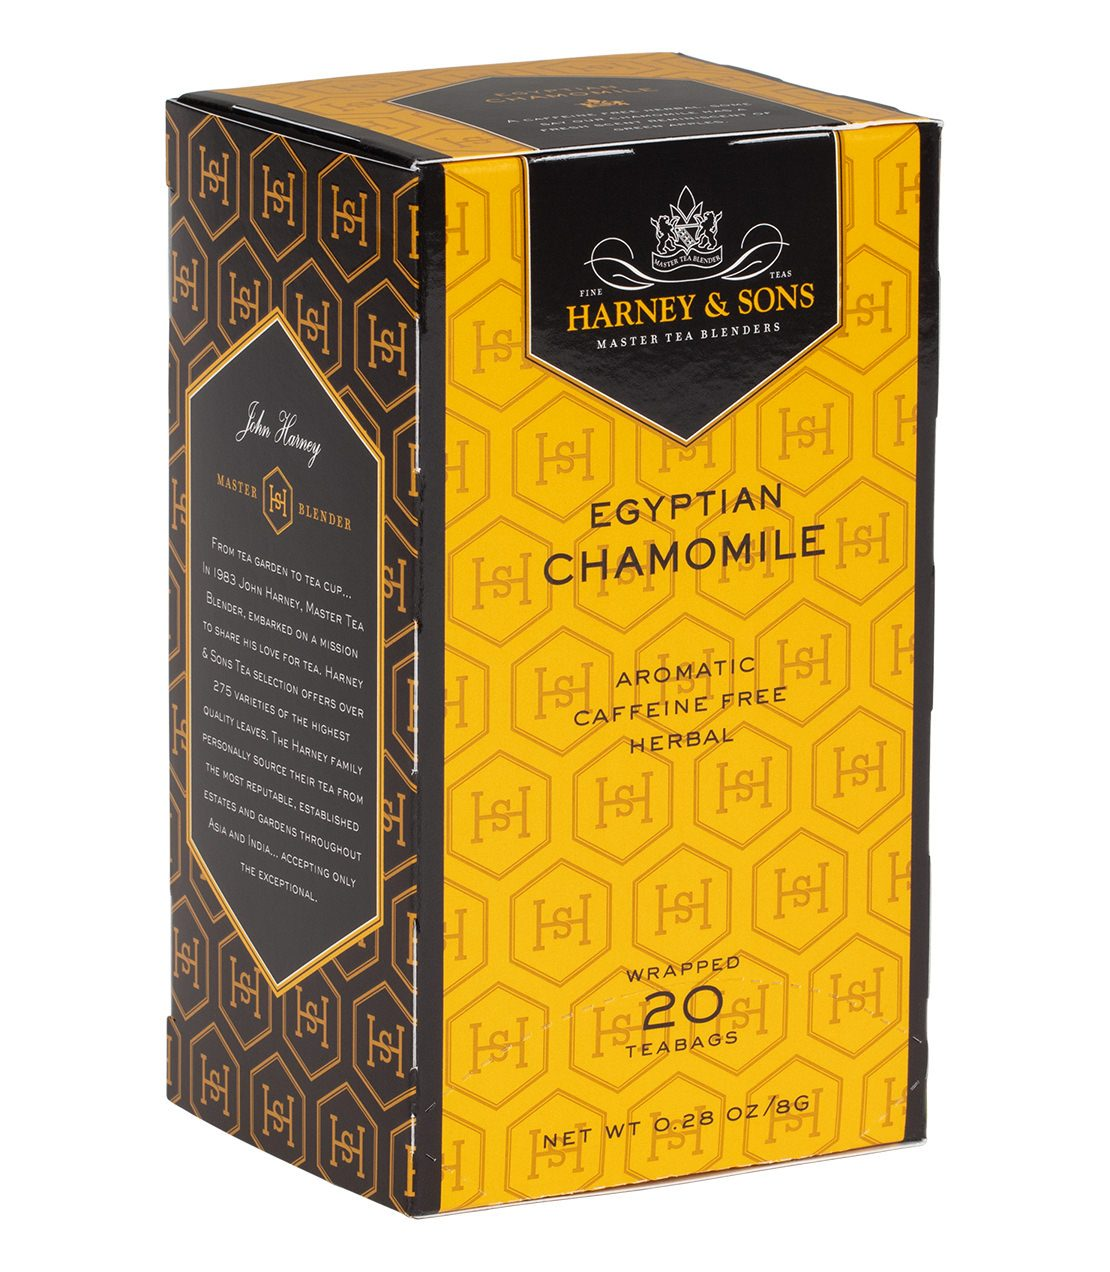 Harney & Sons Chamomile Tea Bags